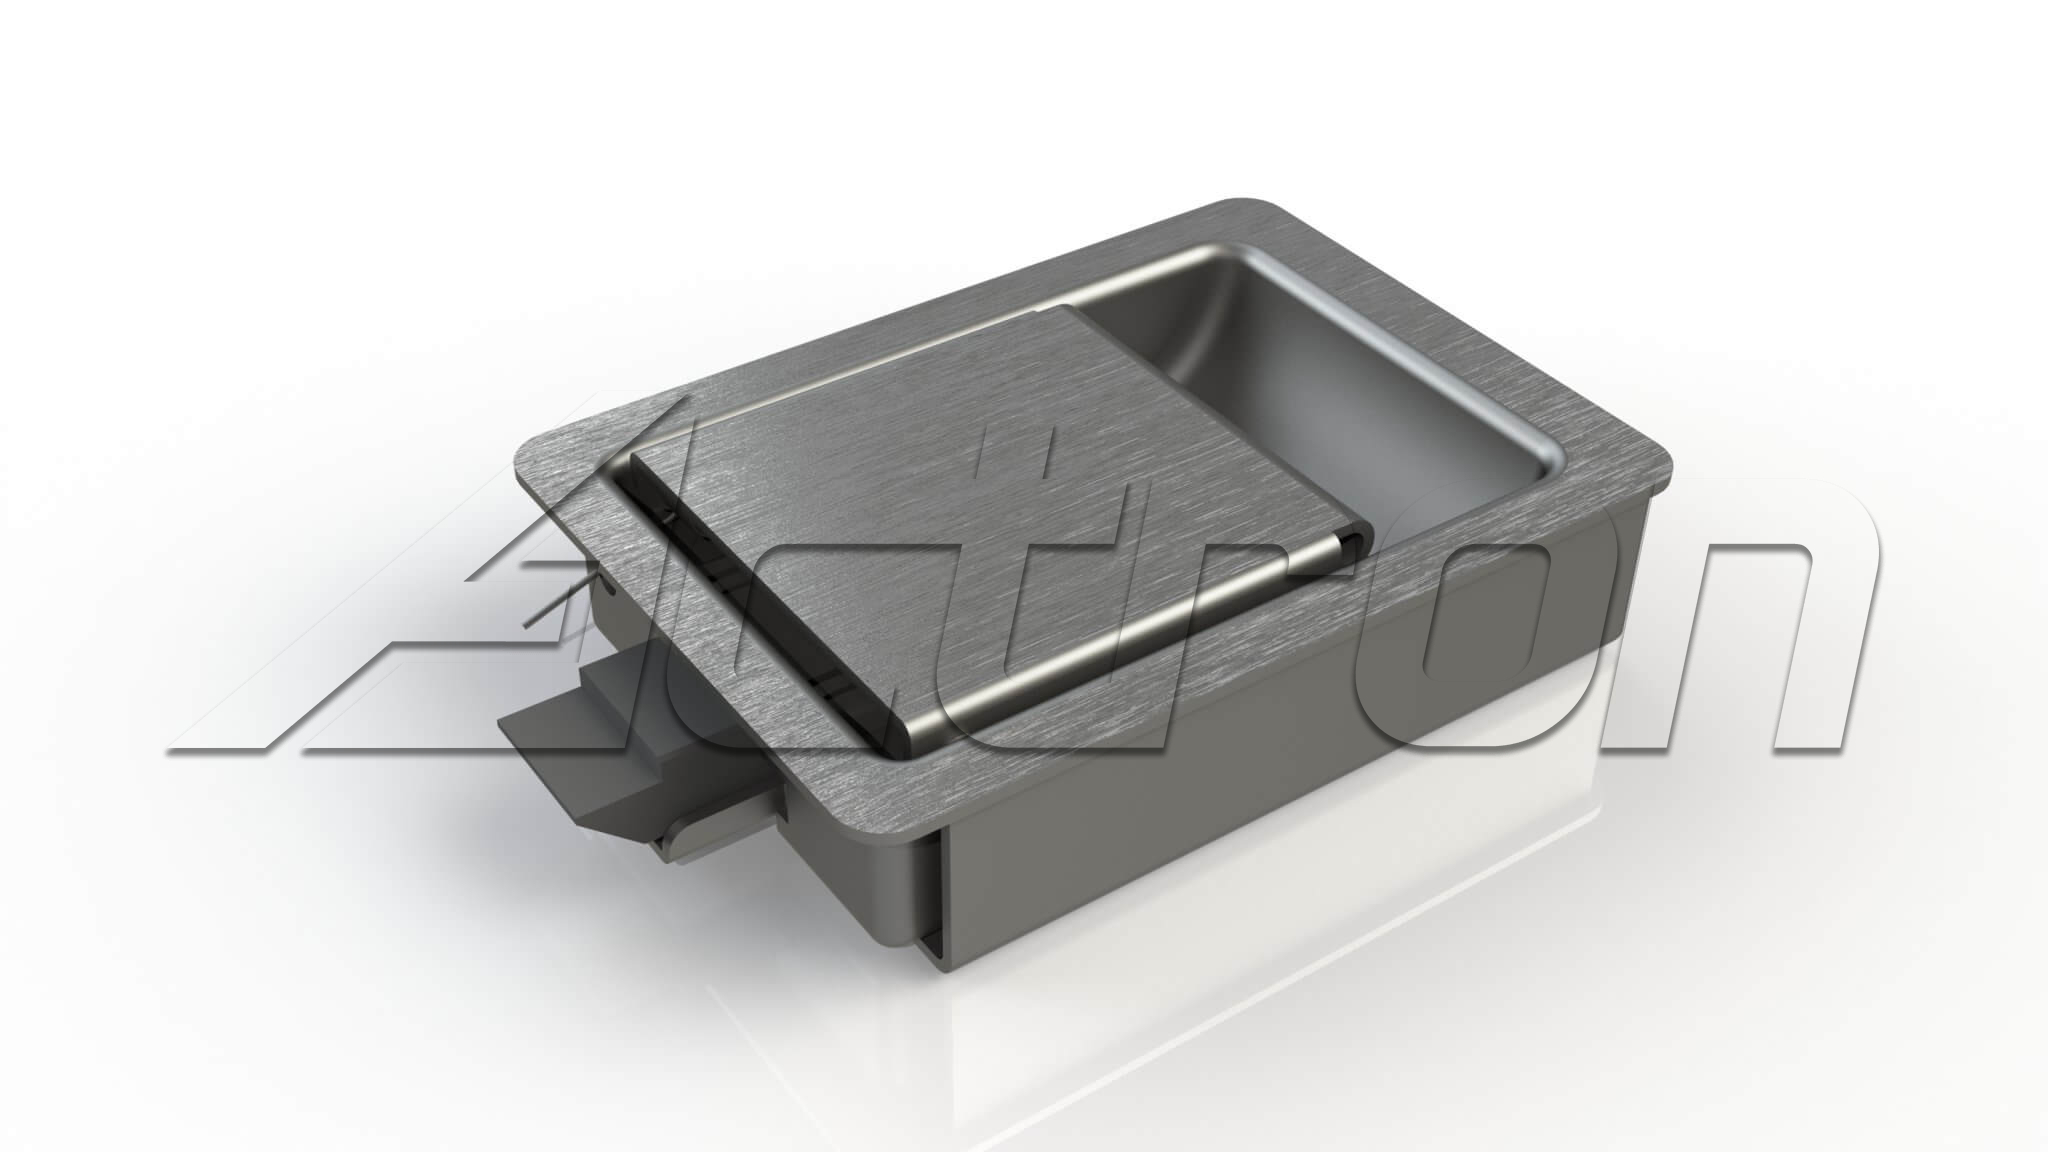 latch-assy-8211-paddle-4244-a23093.jpg